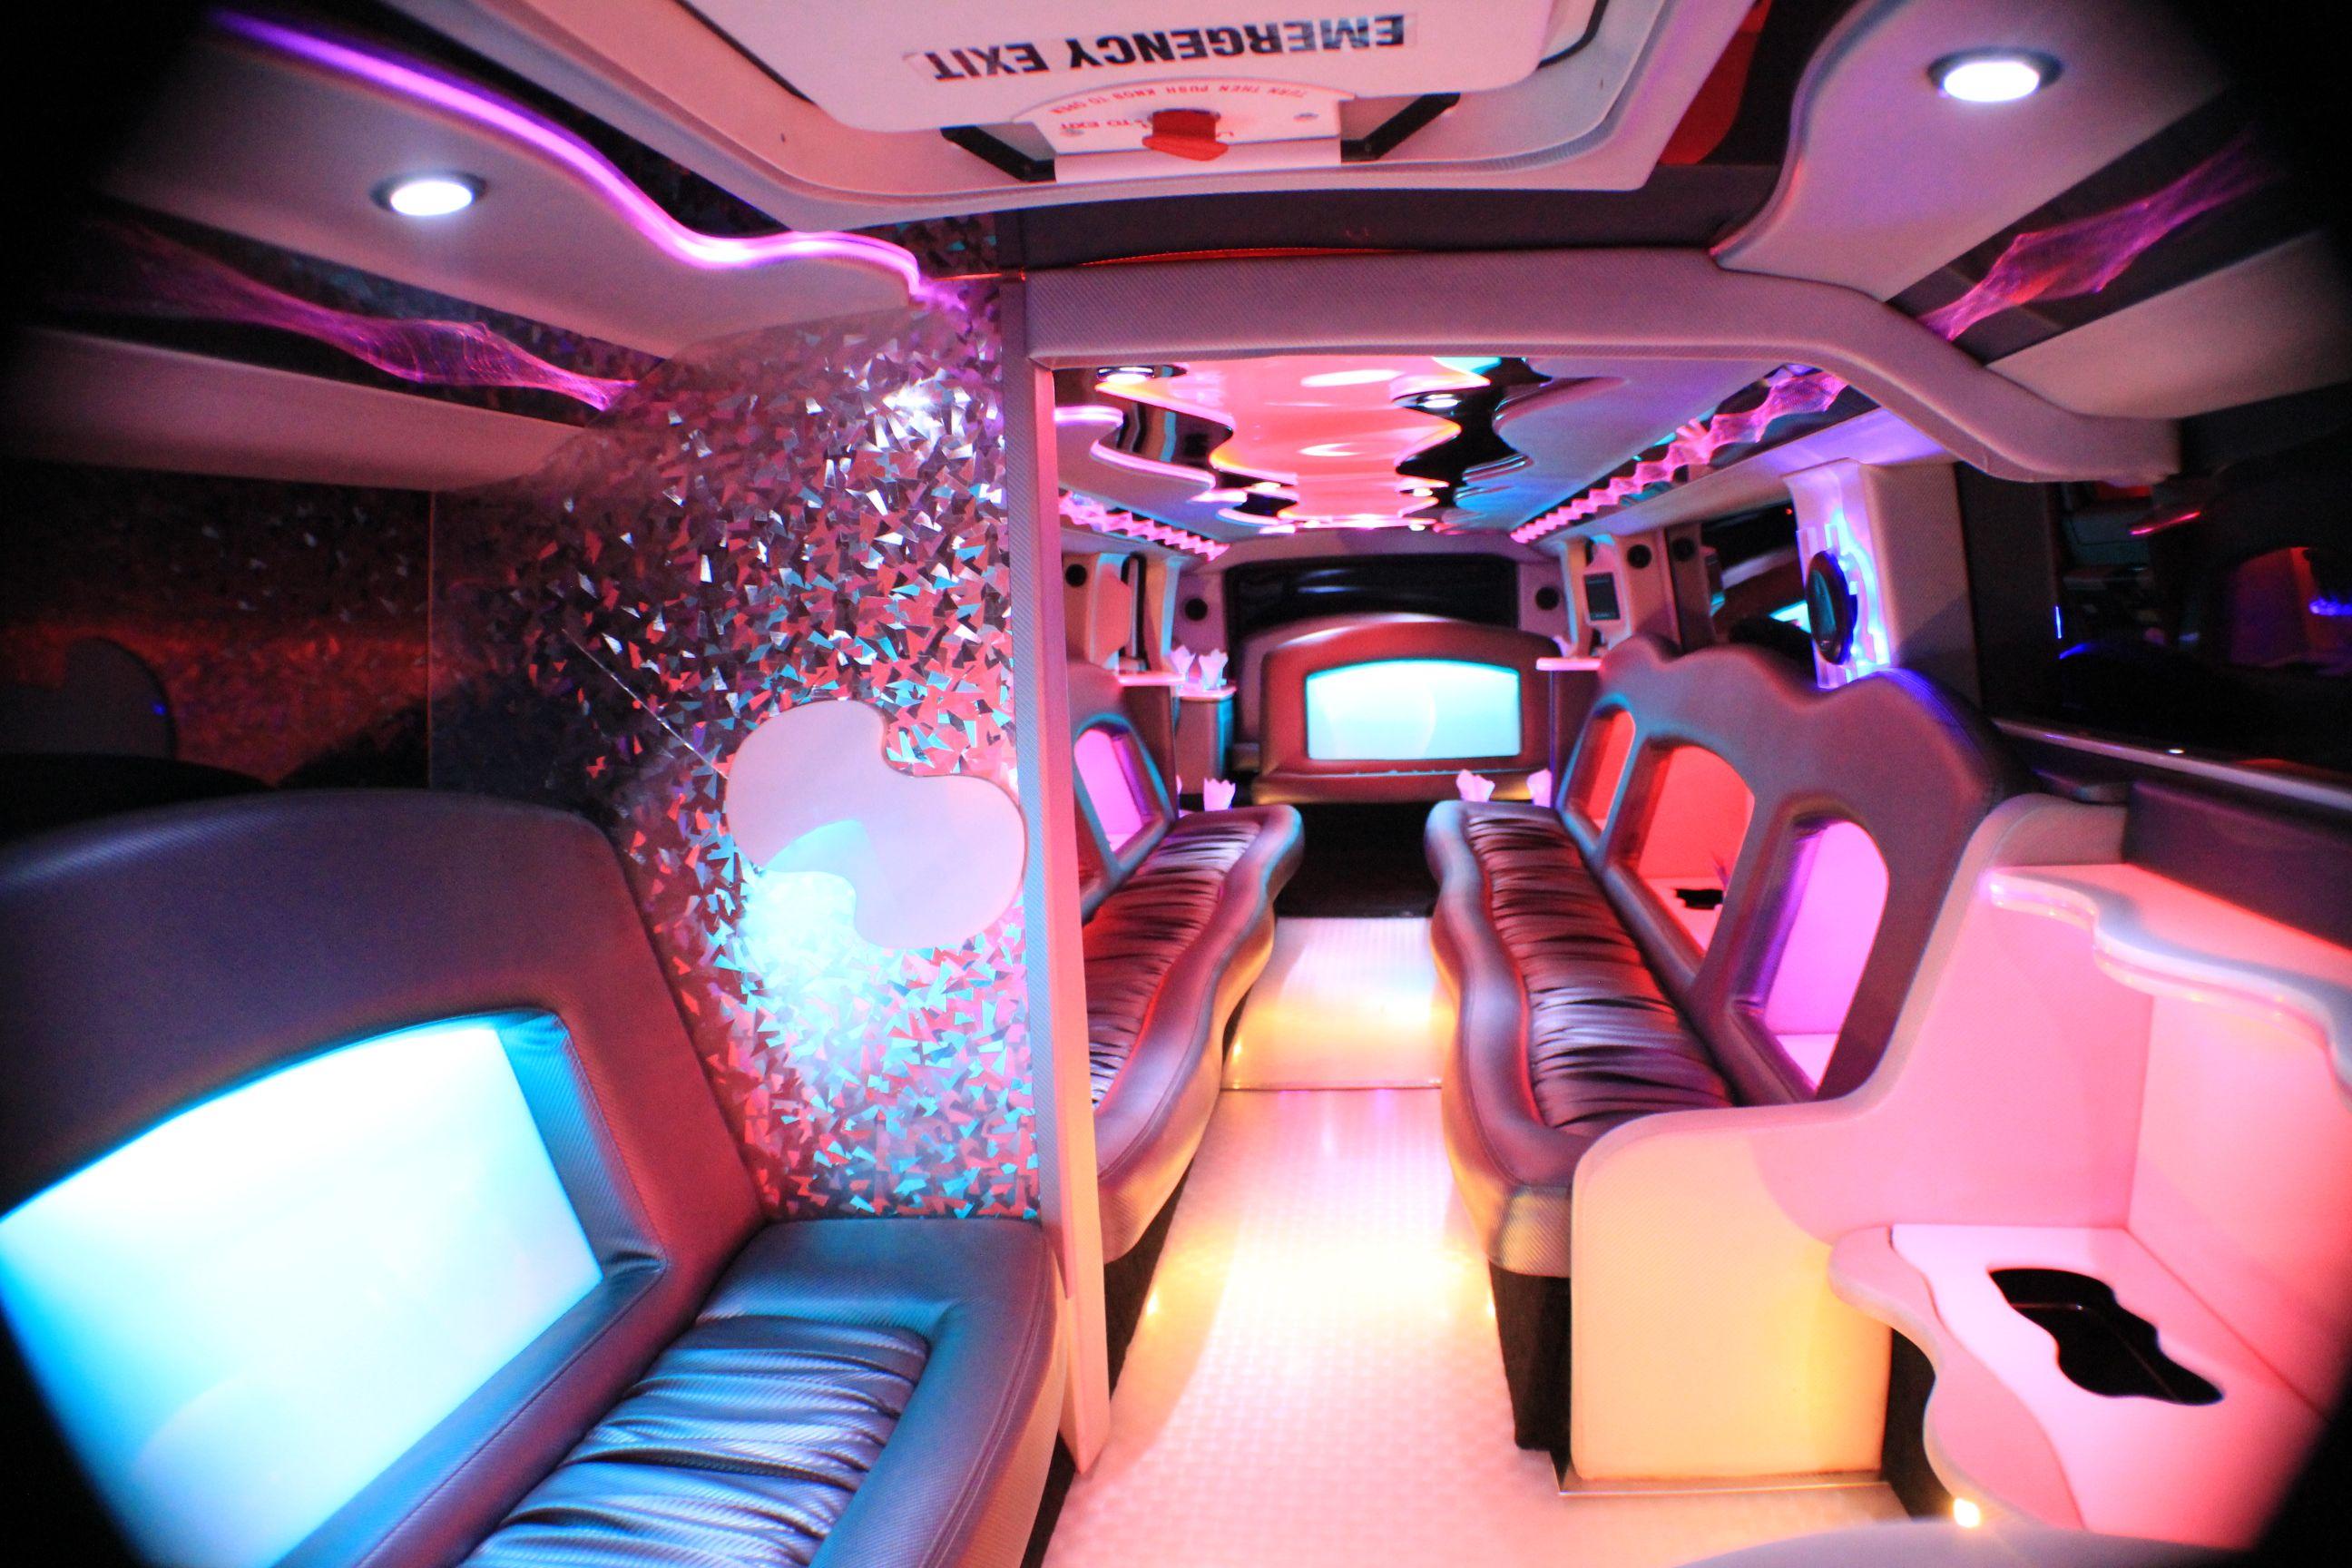 VIP Luxury Hummer Limousine Limousine Pinterest